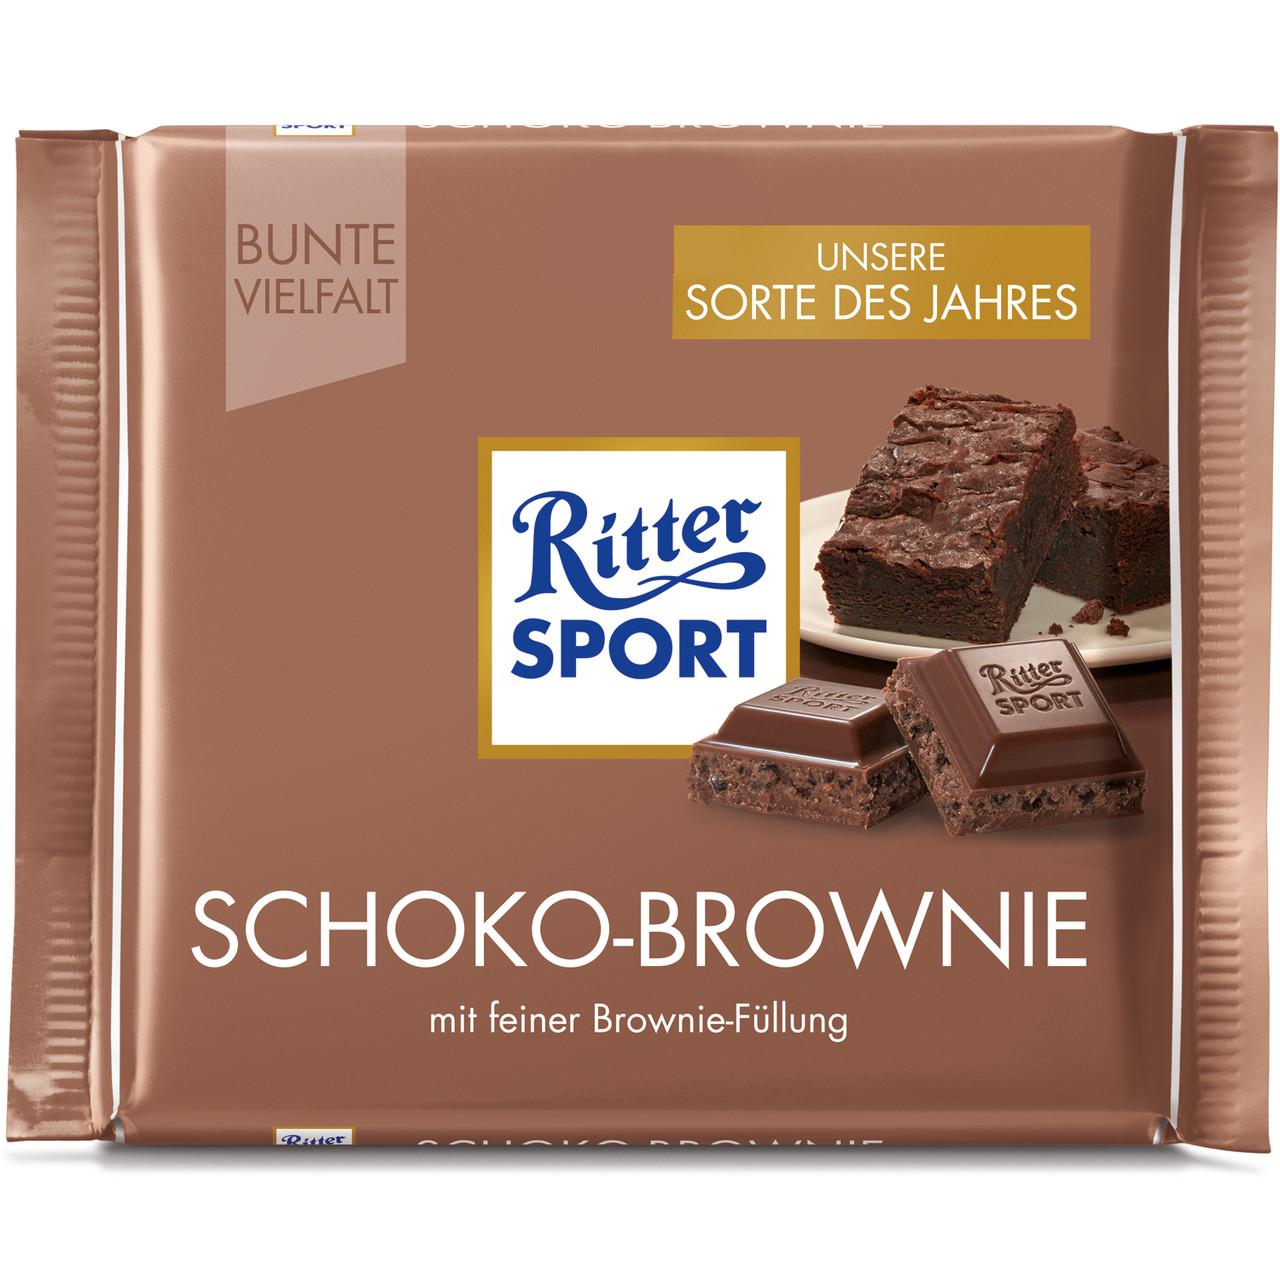 Шоколад Ritter Sport Schoko Brownie (Риттер Спорт), 100 г